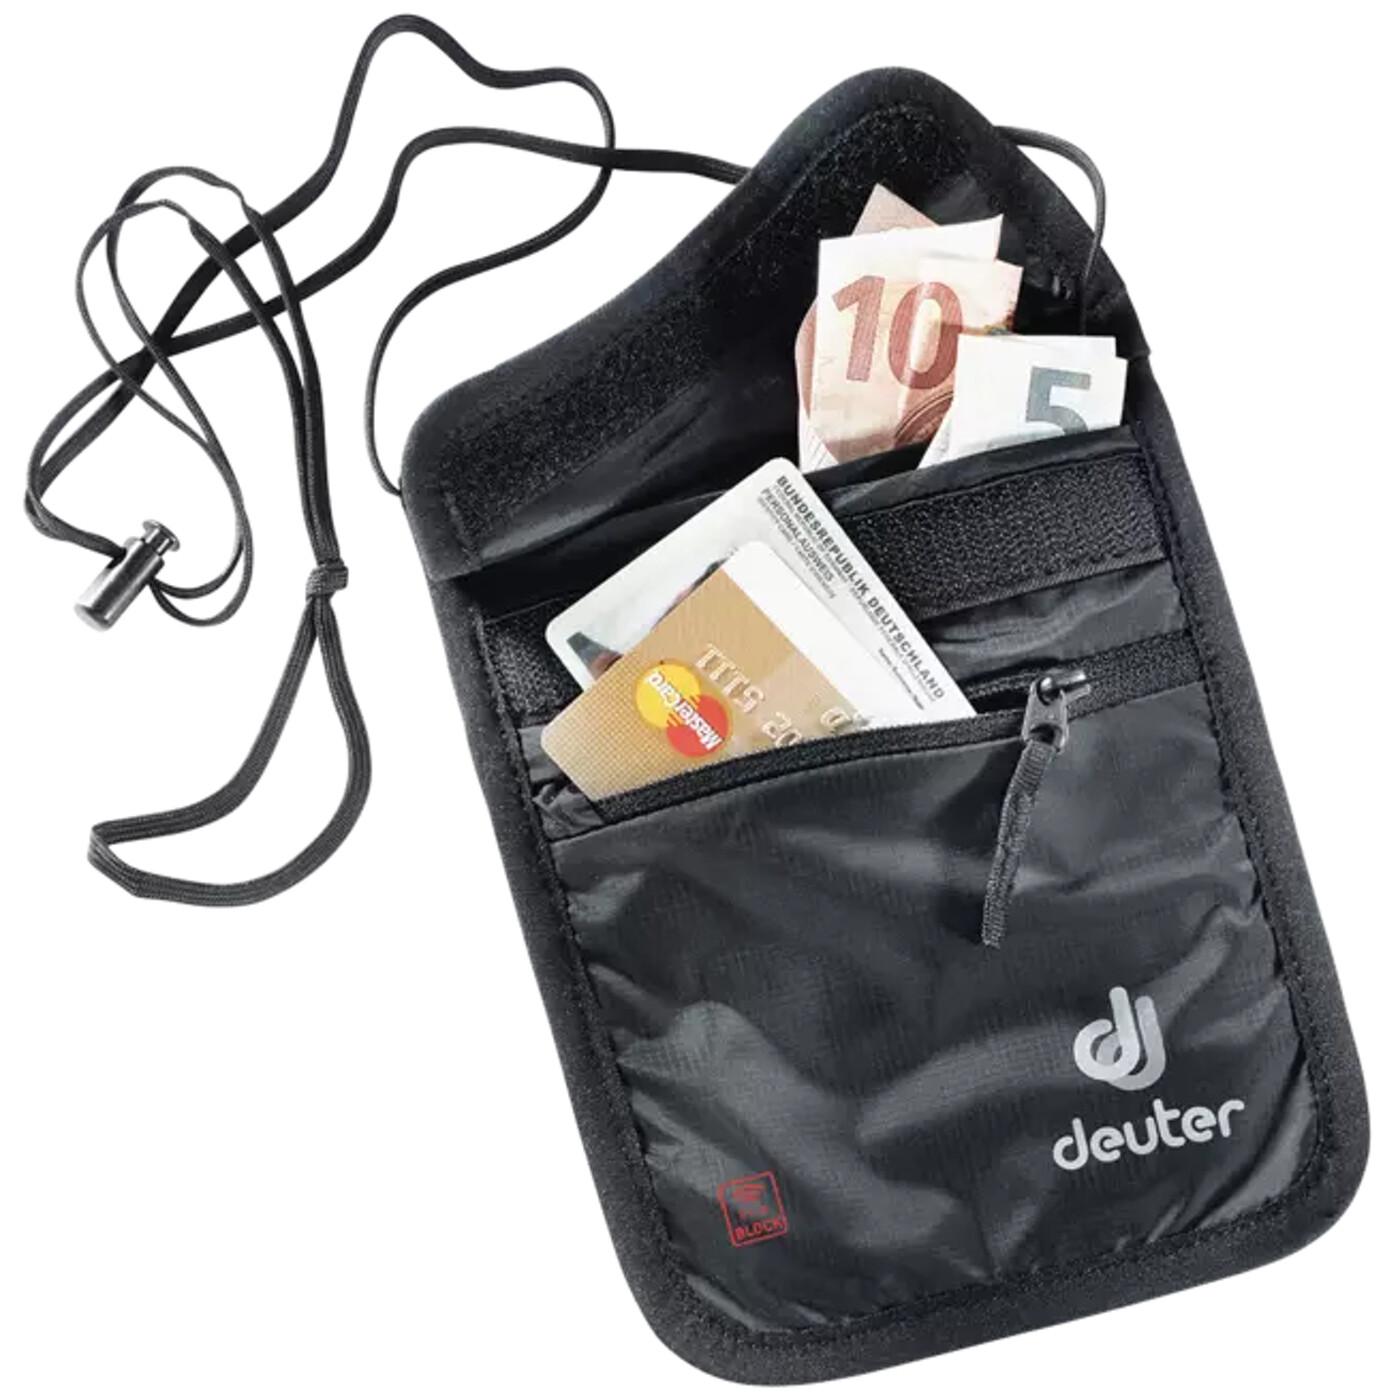 DEUTER Reiseaccessoire Security Wallet II RFID BLOCK